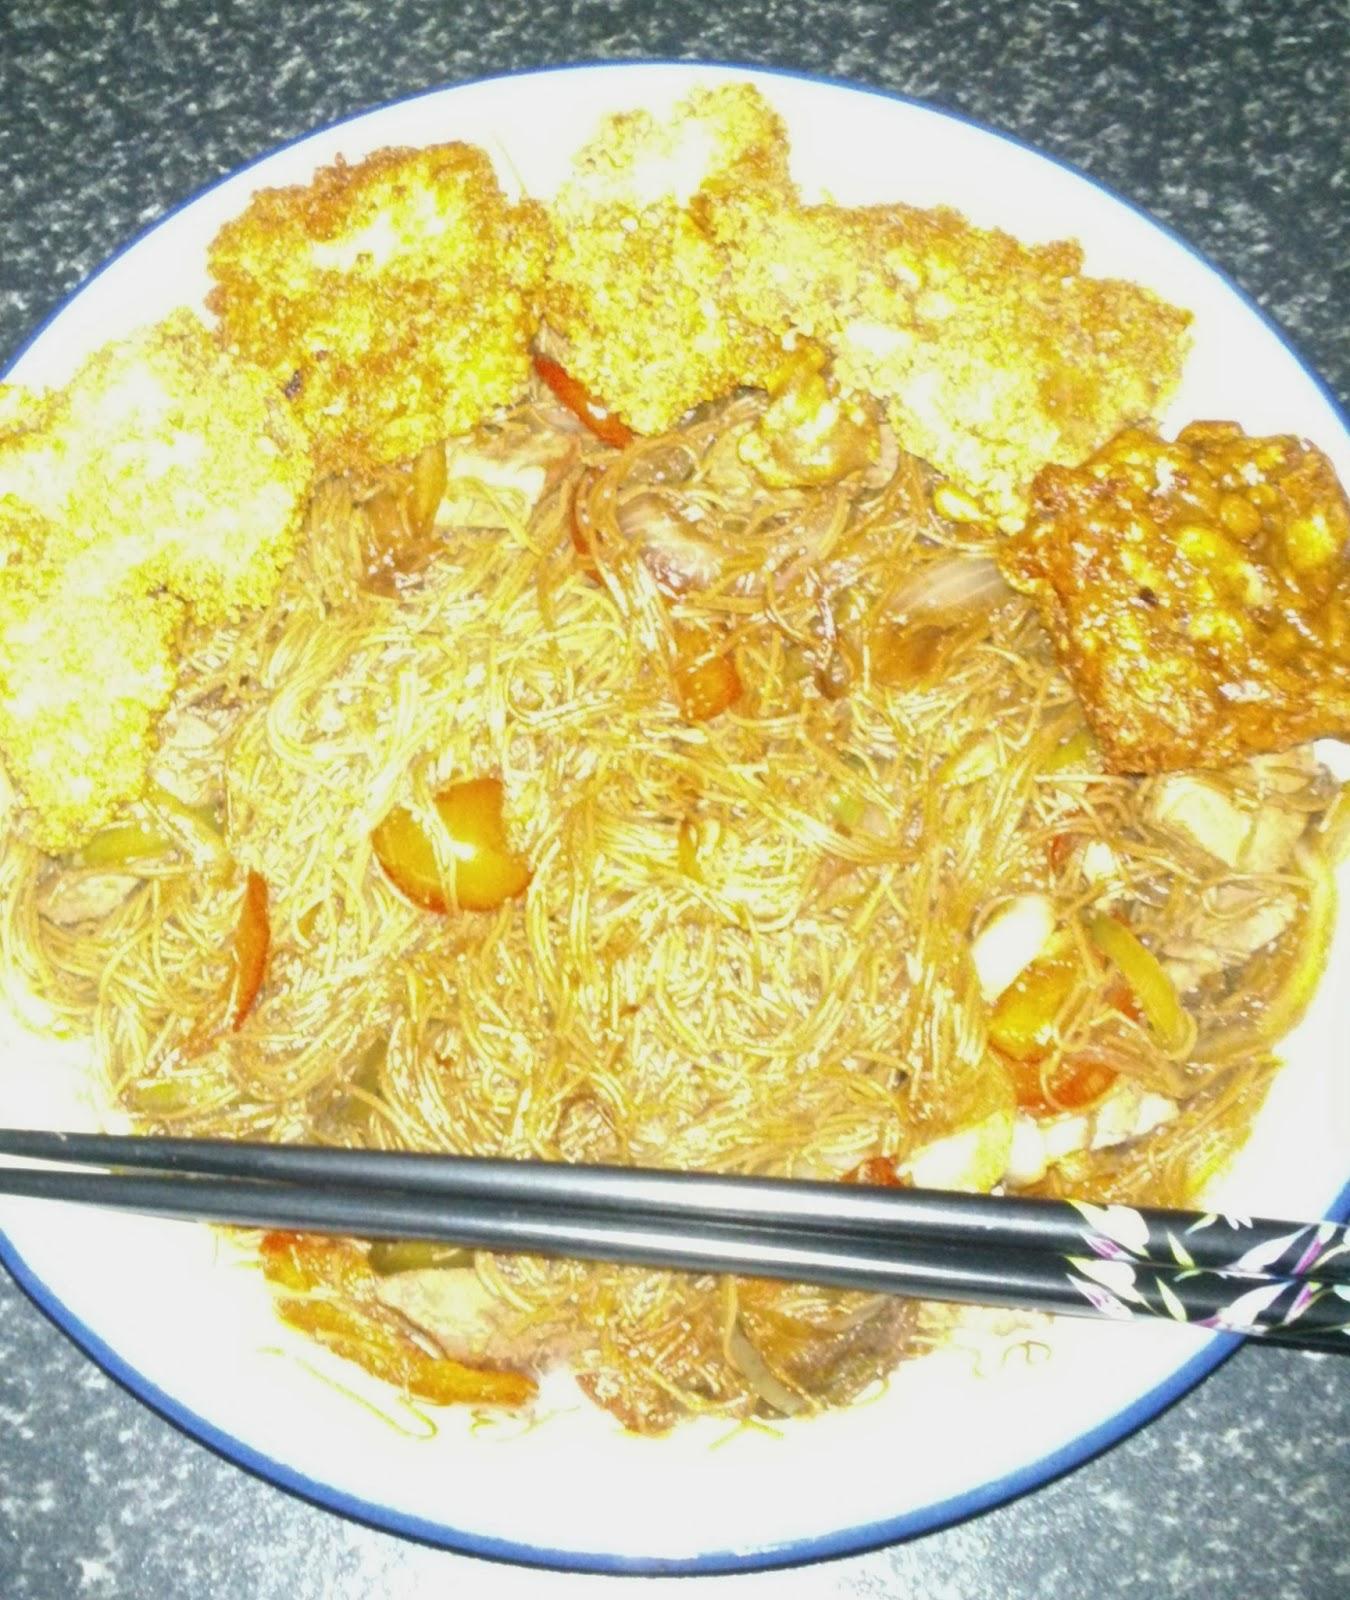 ... blog de SushiGeek!: Nueva entrega de SushiGeek Cooking!! Tori Kara-Age